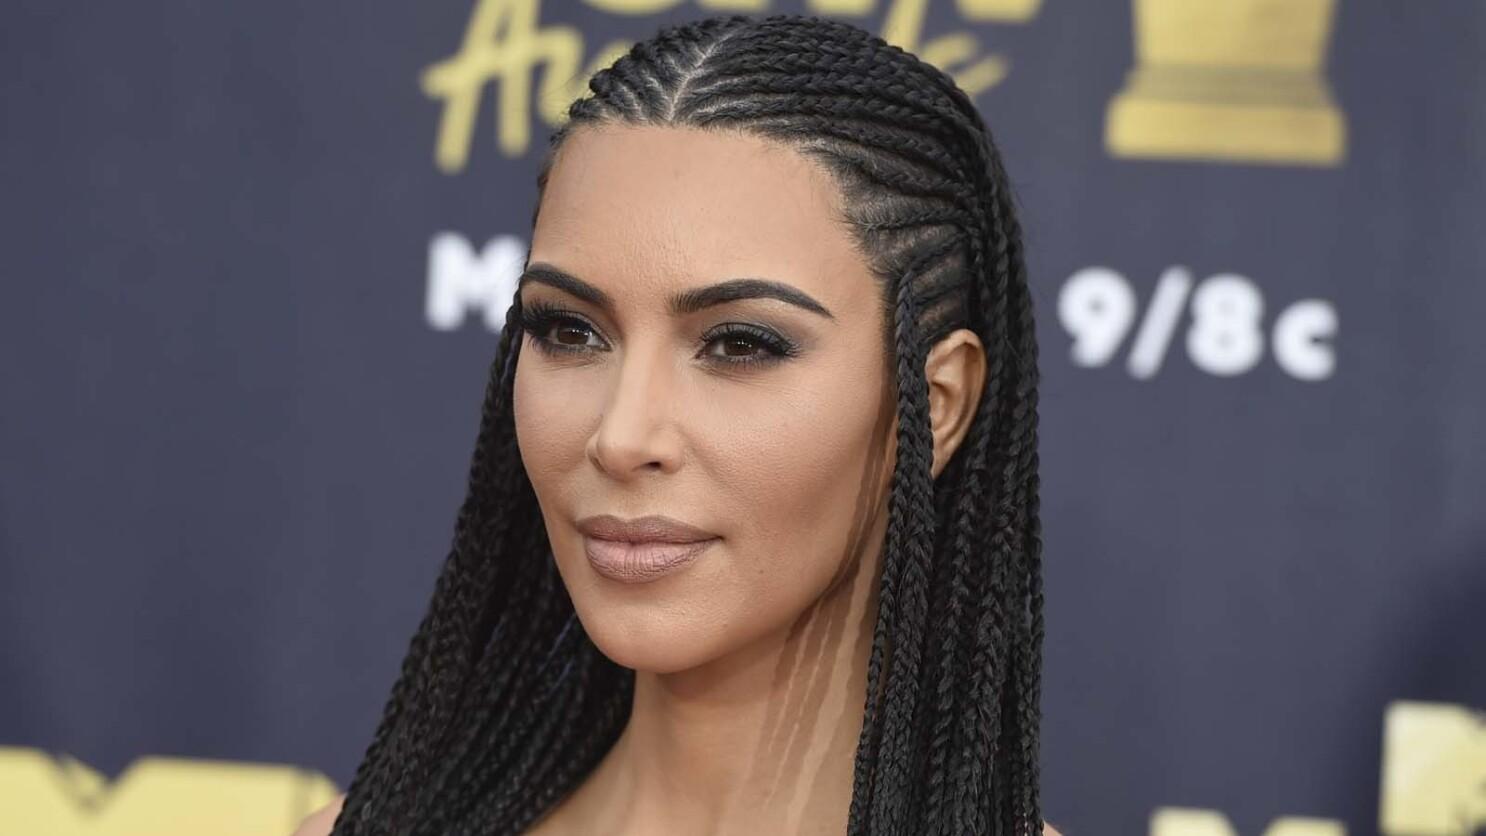 Kim Kardashian just trademarked 'Kimono.' Let the backlash begin - Los Angeles Times